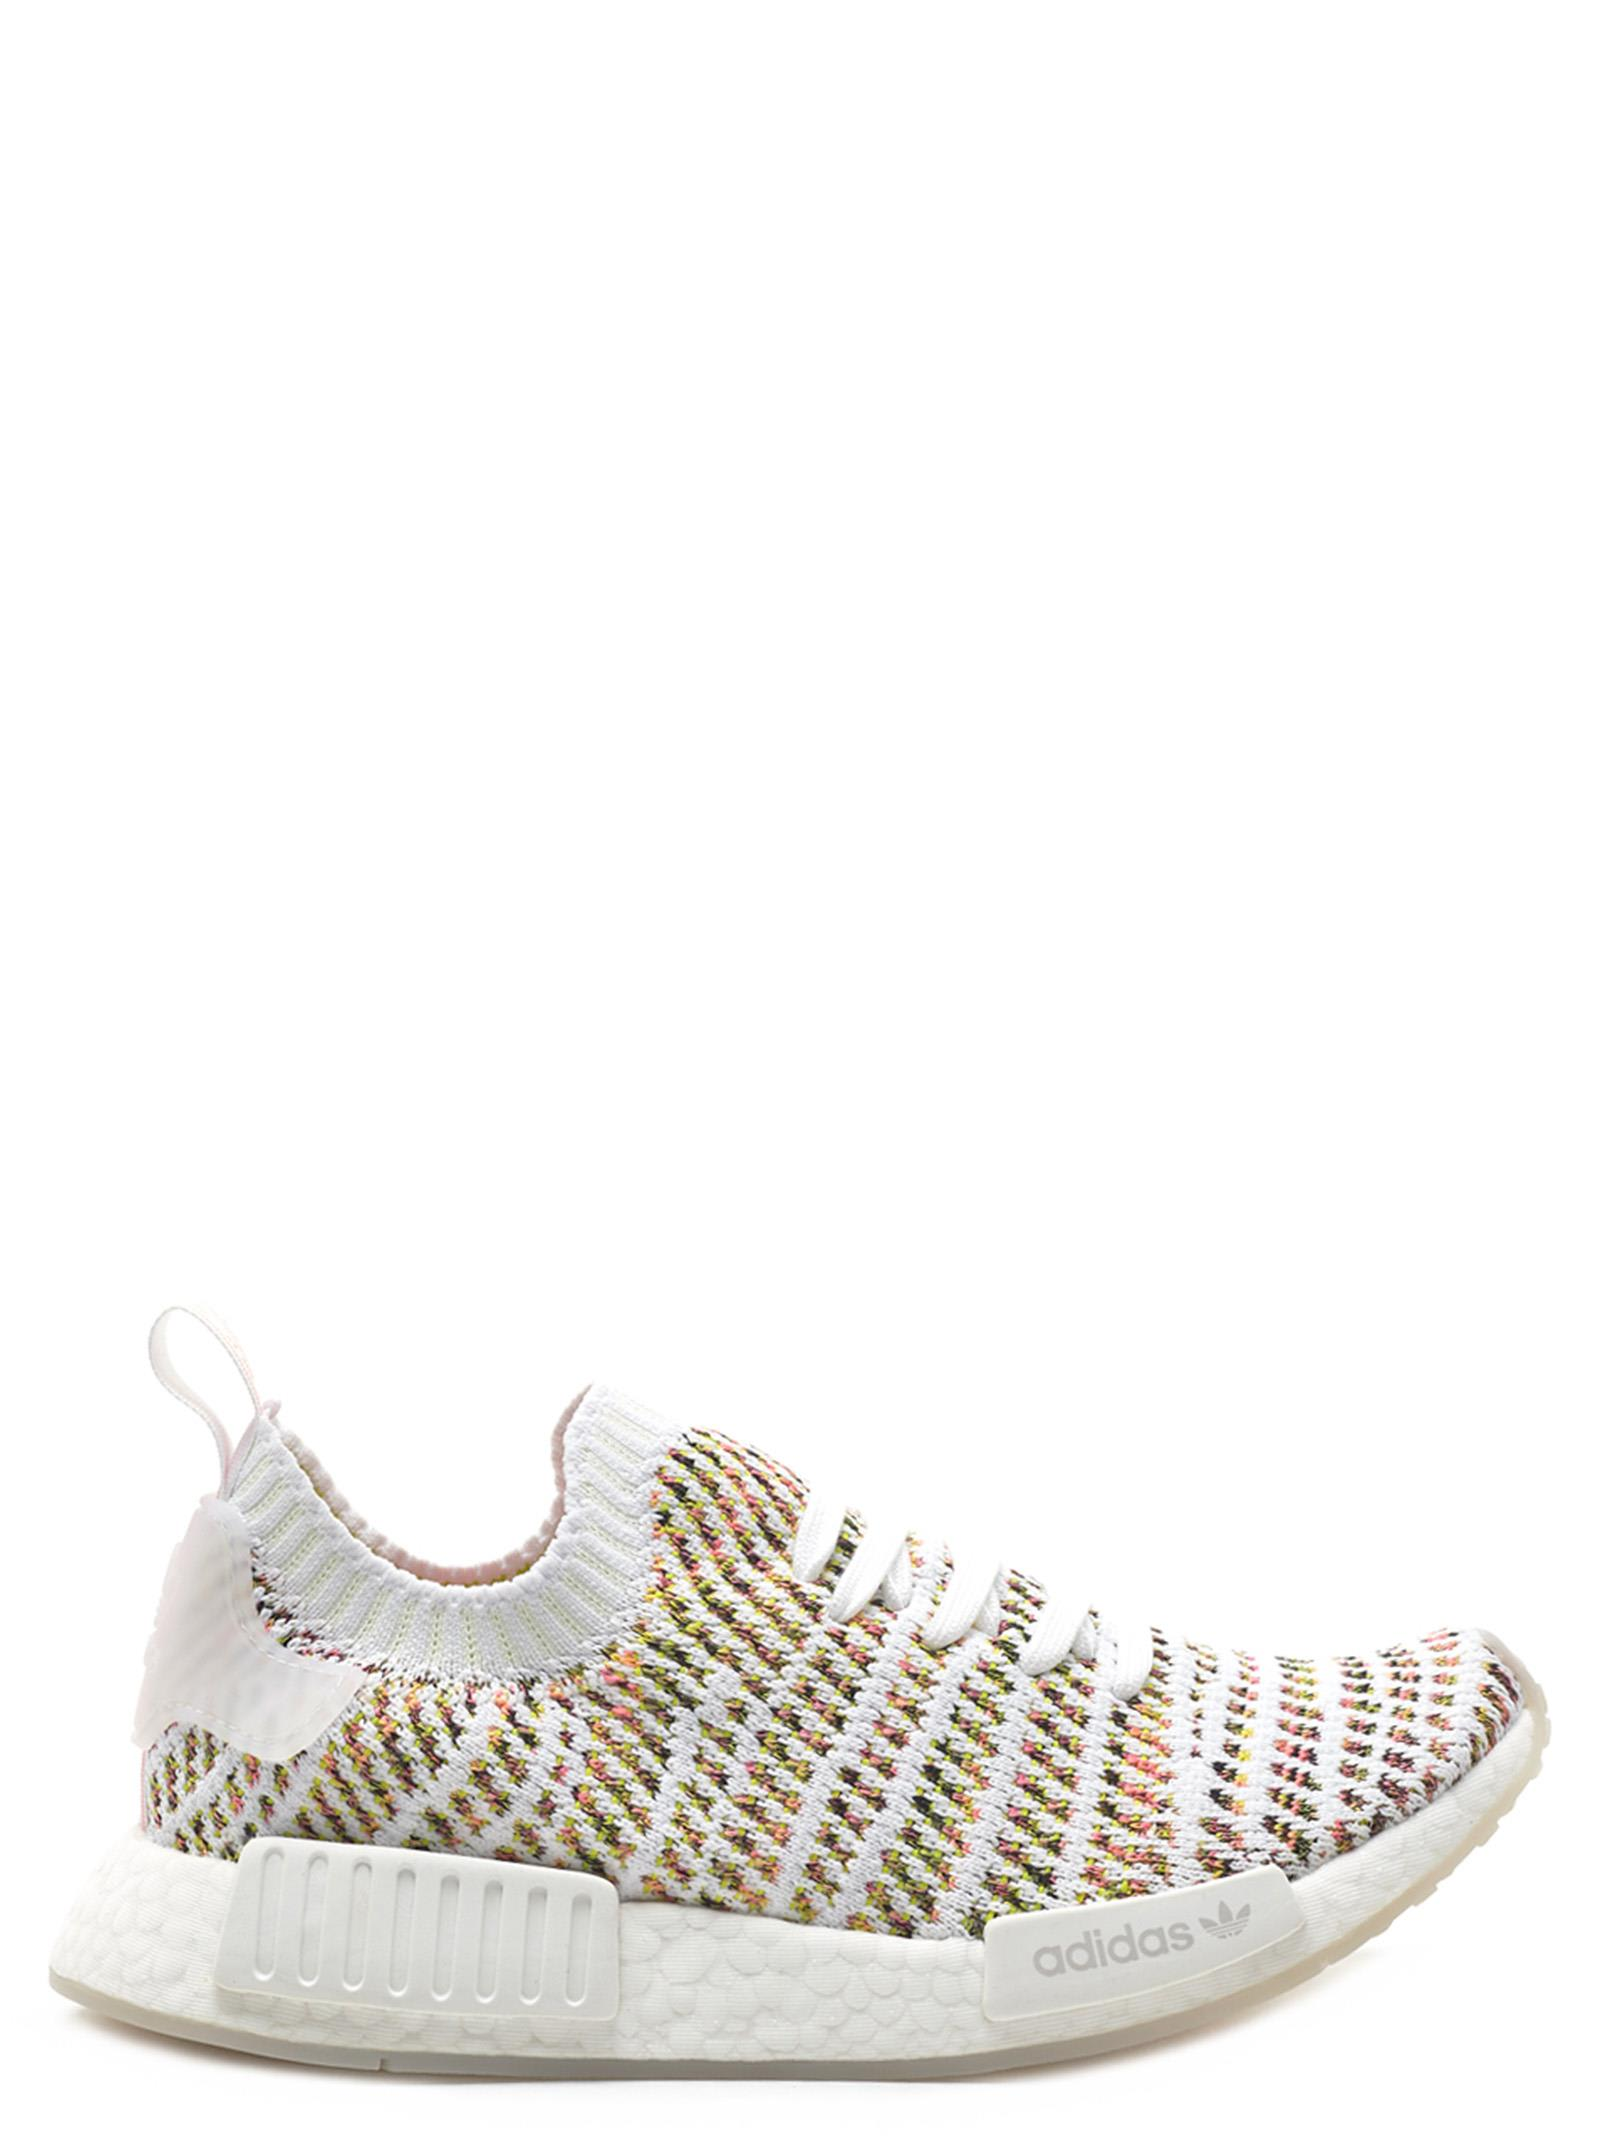 Best price on the market at italist | Adidas Originals Adidas Originals 'nmd R1' Shoes